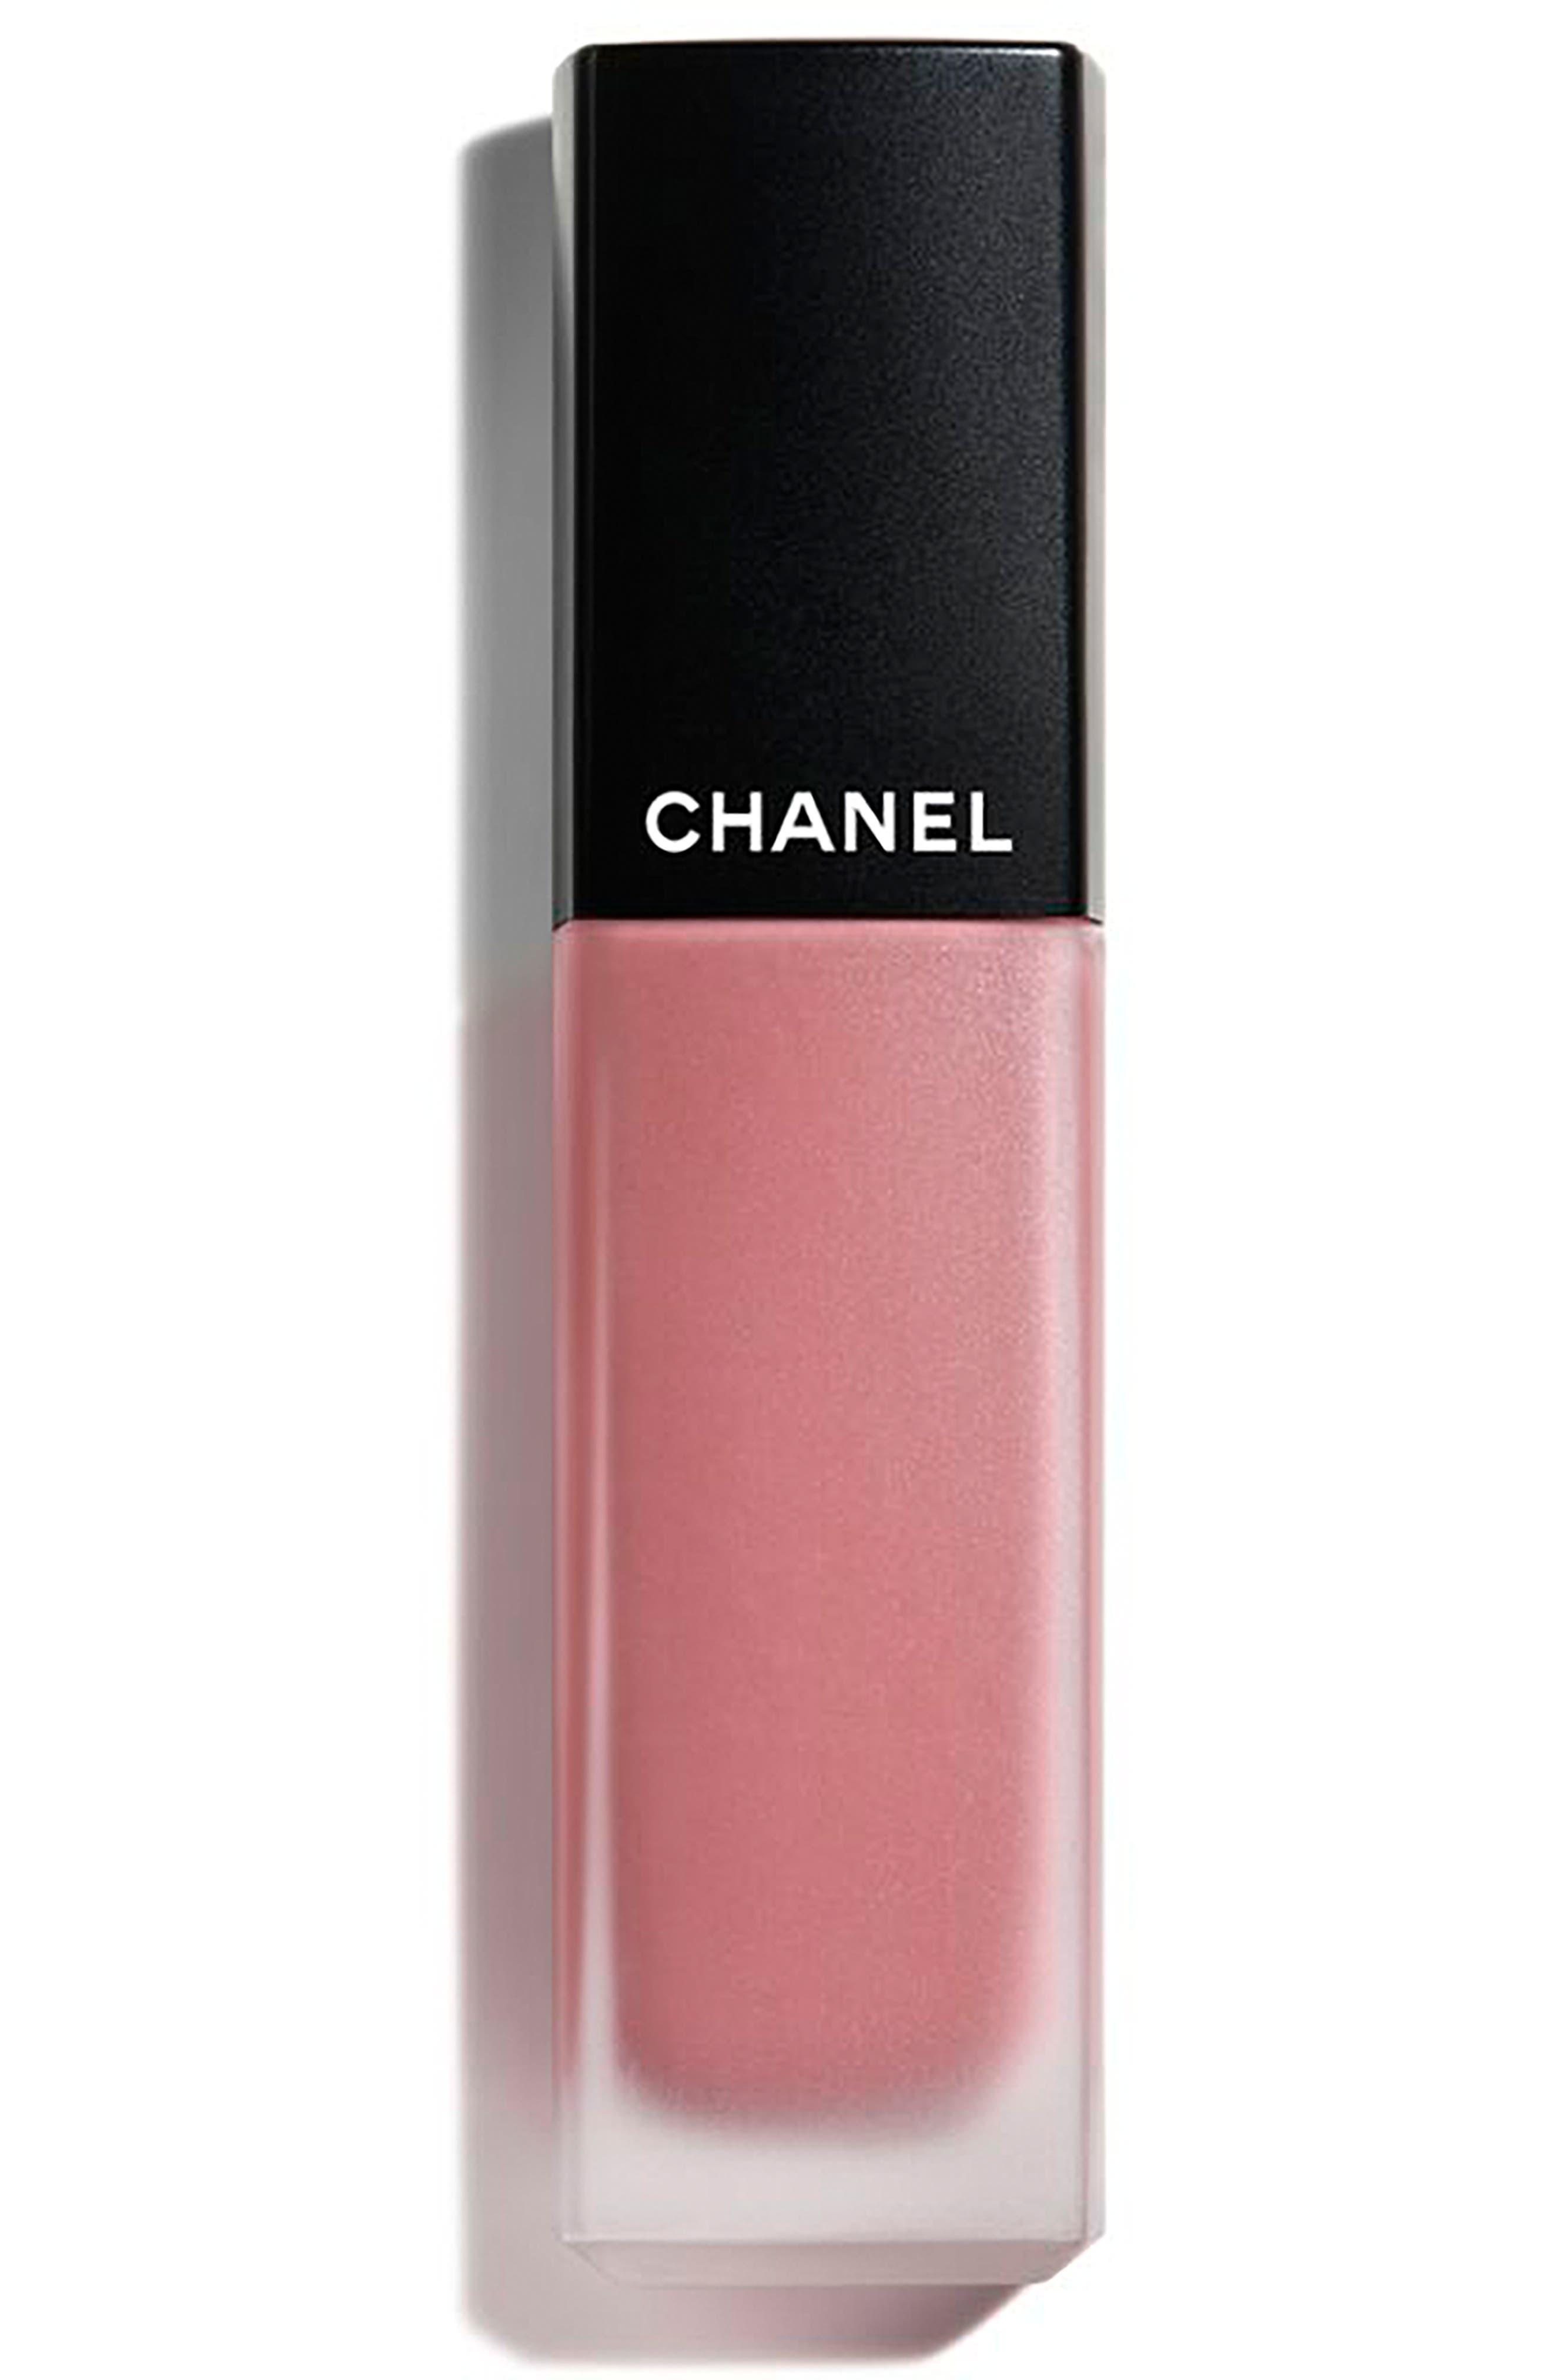 ROUGE ALLURE INK Matte Liquid Lip Colour,                         Main,                         color, 168 Serenity